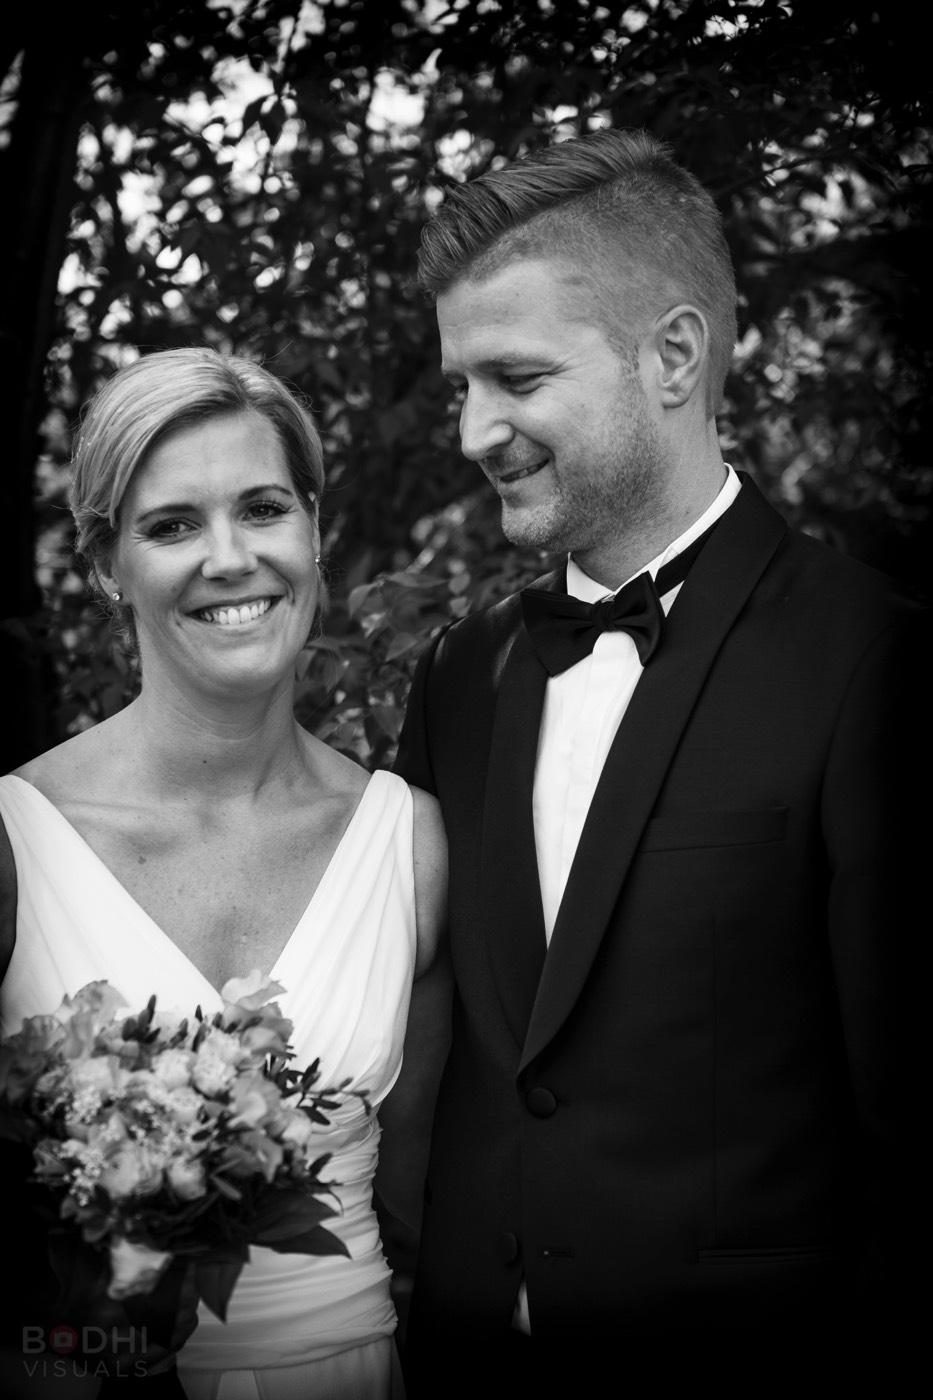 Bryllupsbilleder-net-reference-01-1400pxl